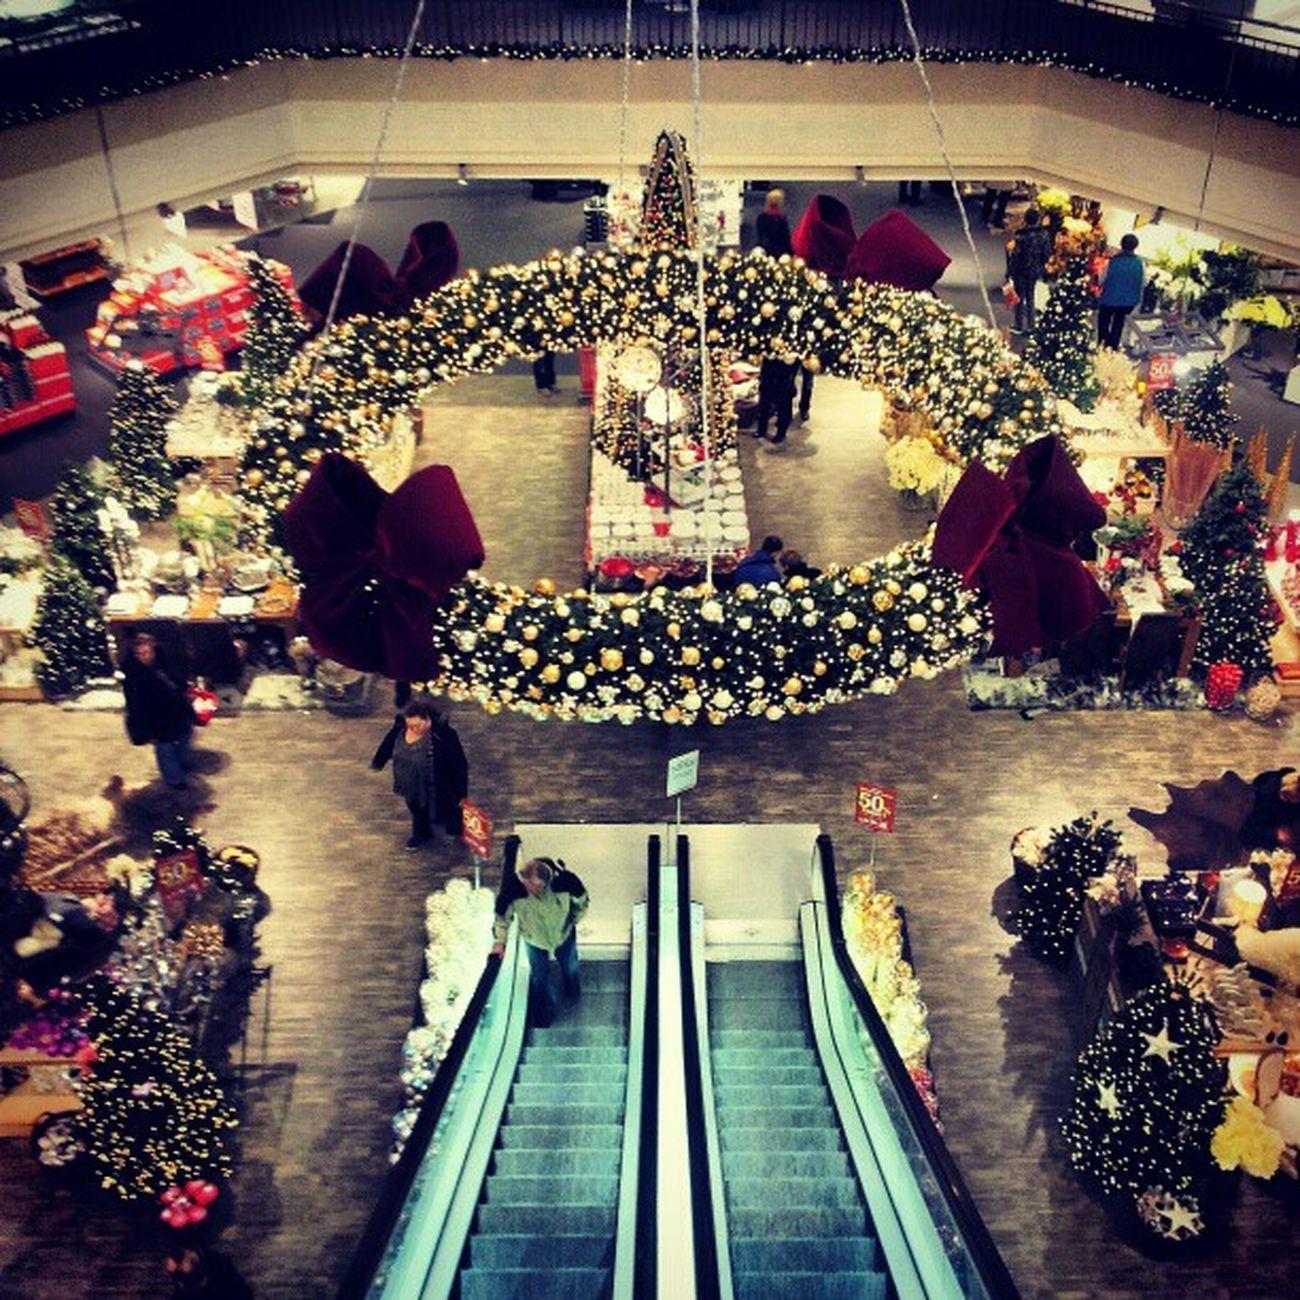 #рождество #christmas #weihnachten Christmas Weihnachten рождество